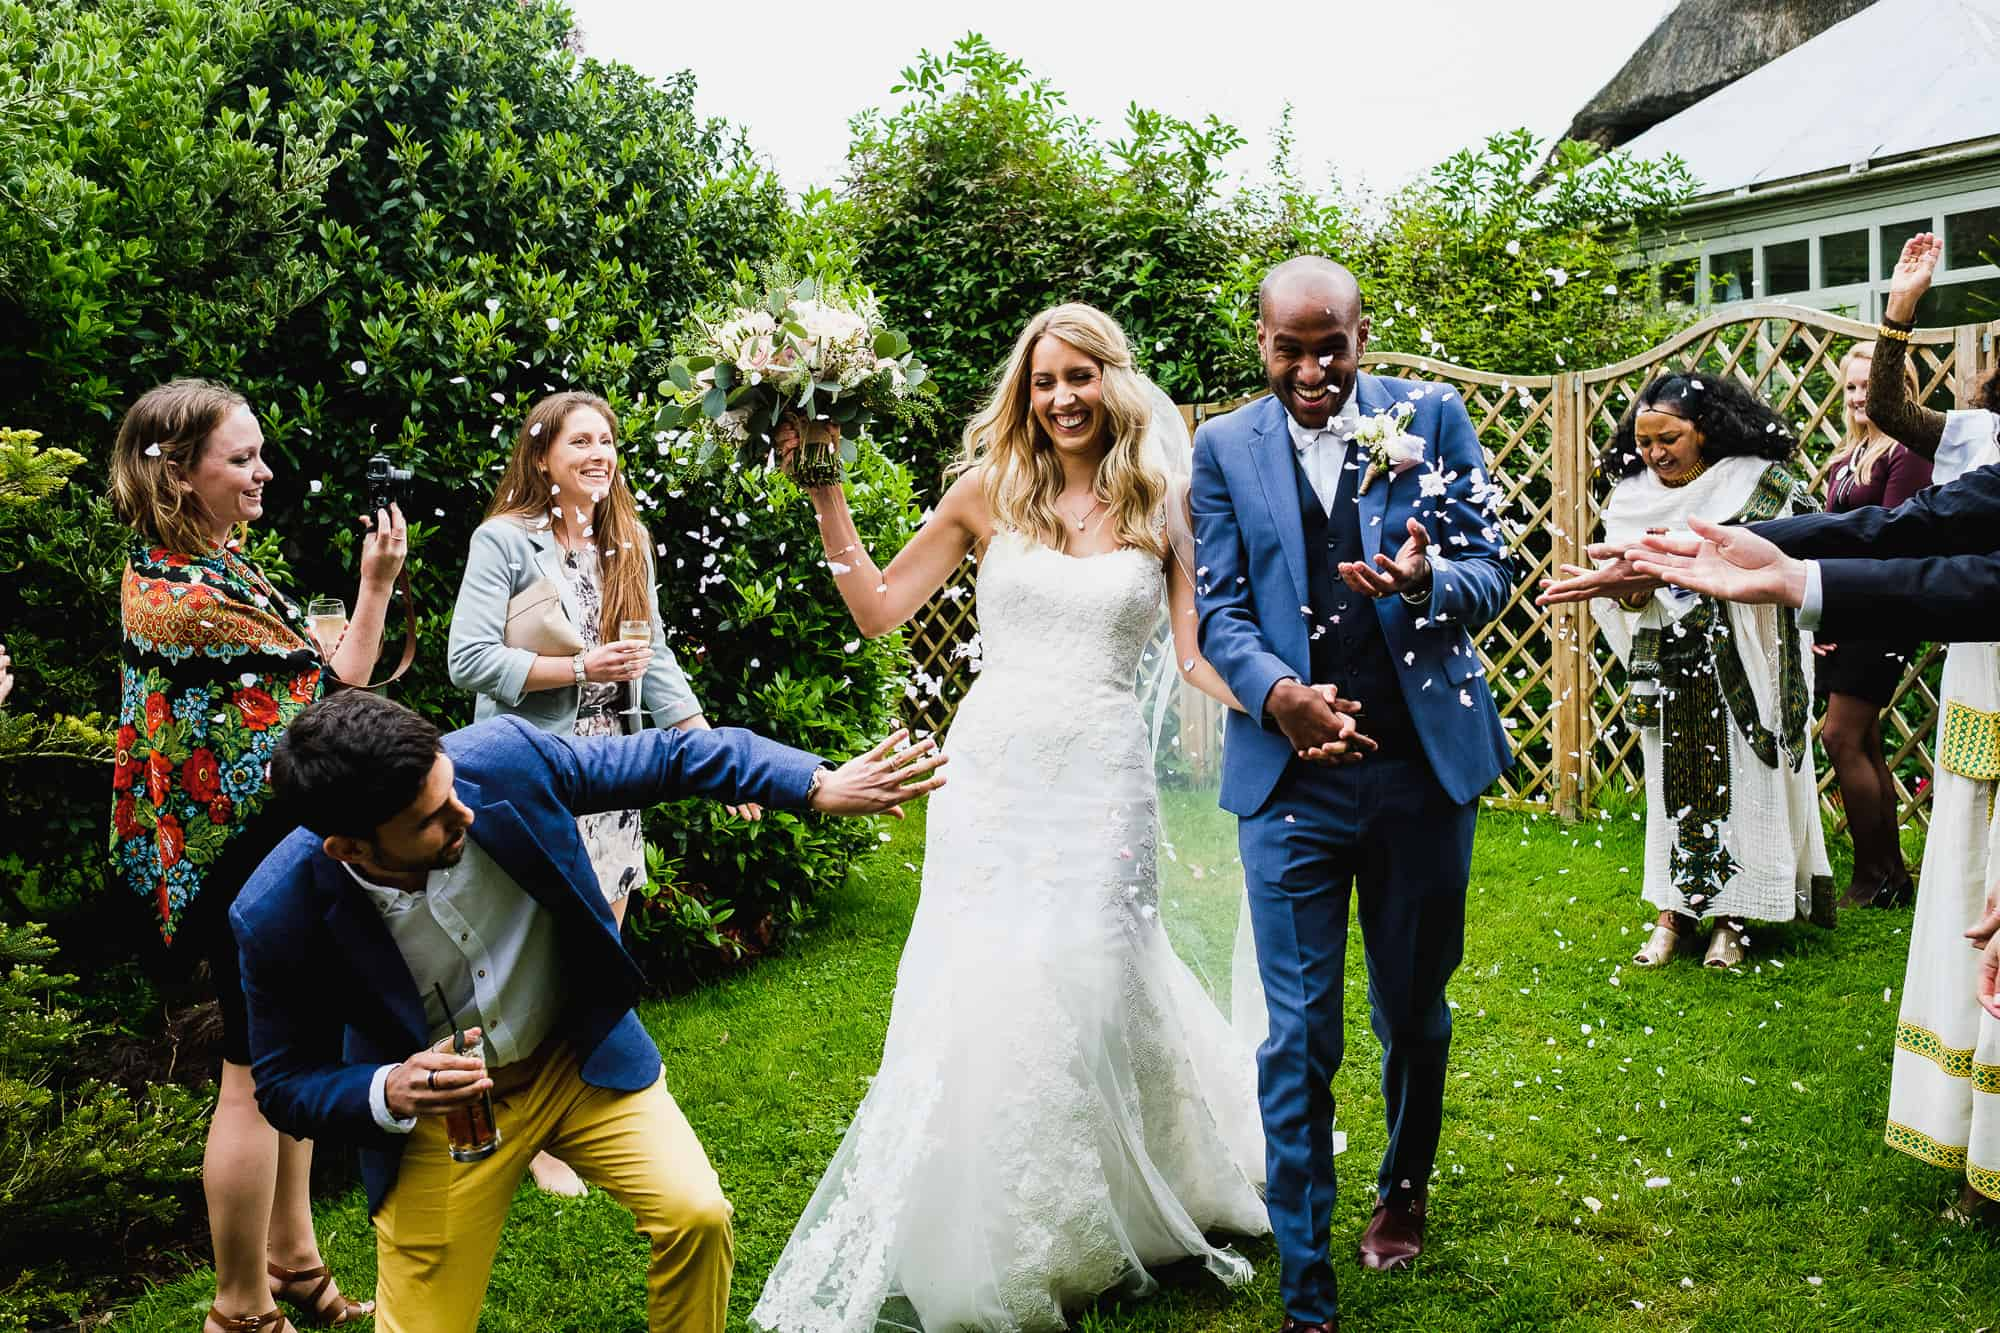 marleybrook-house-wedding-photography-matt-tyler-0034